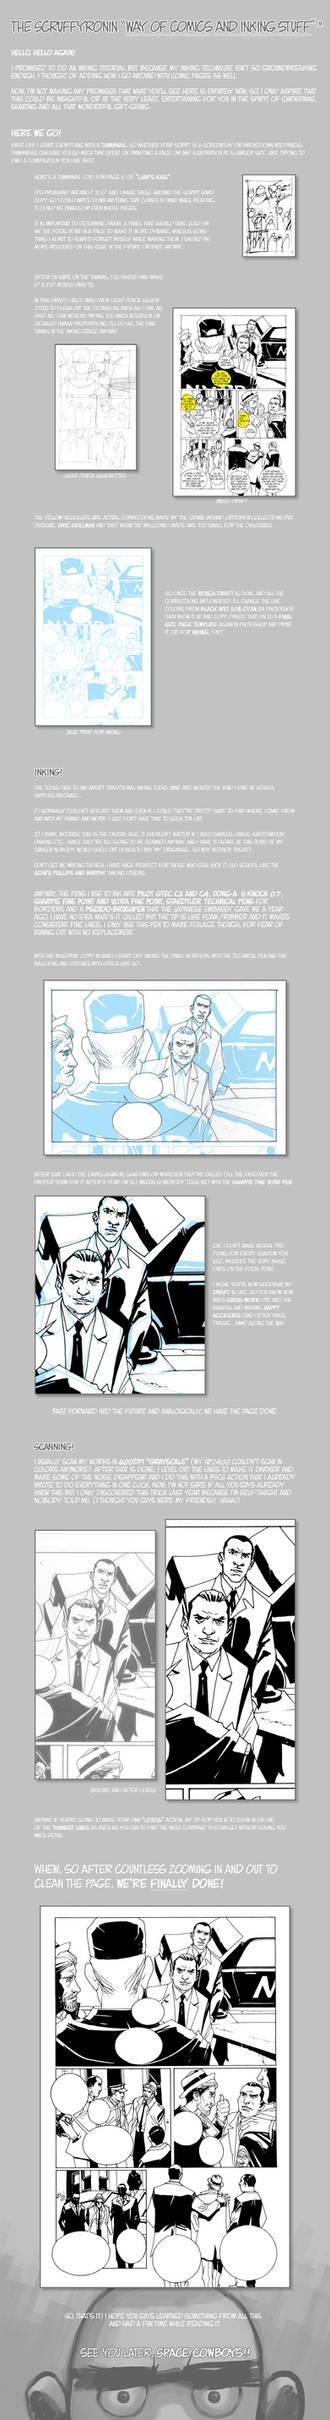 Comics and Inking Walkthrough